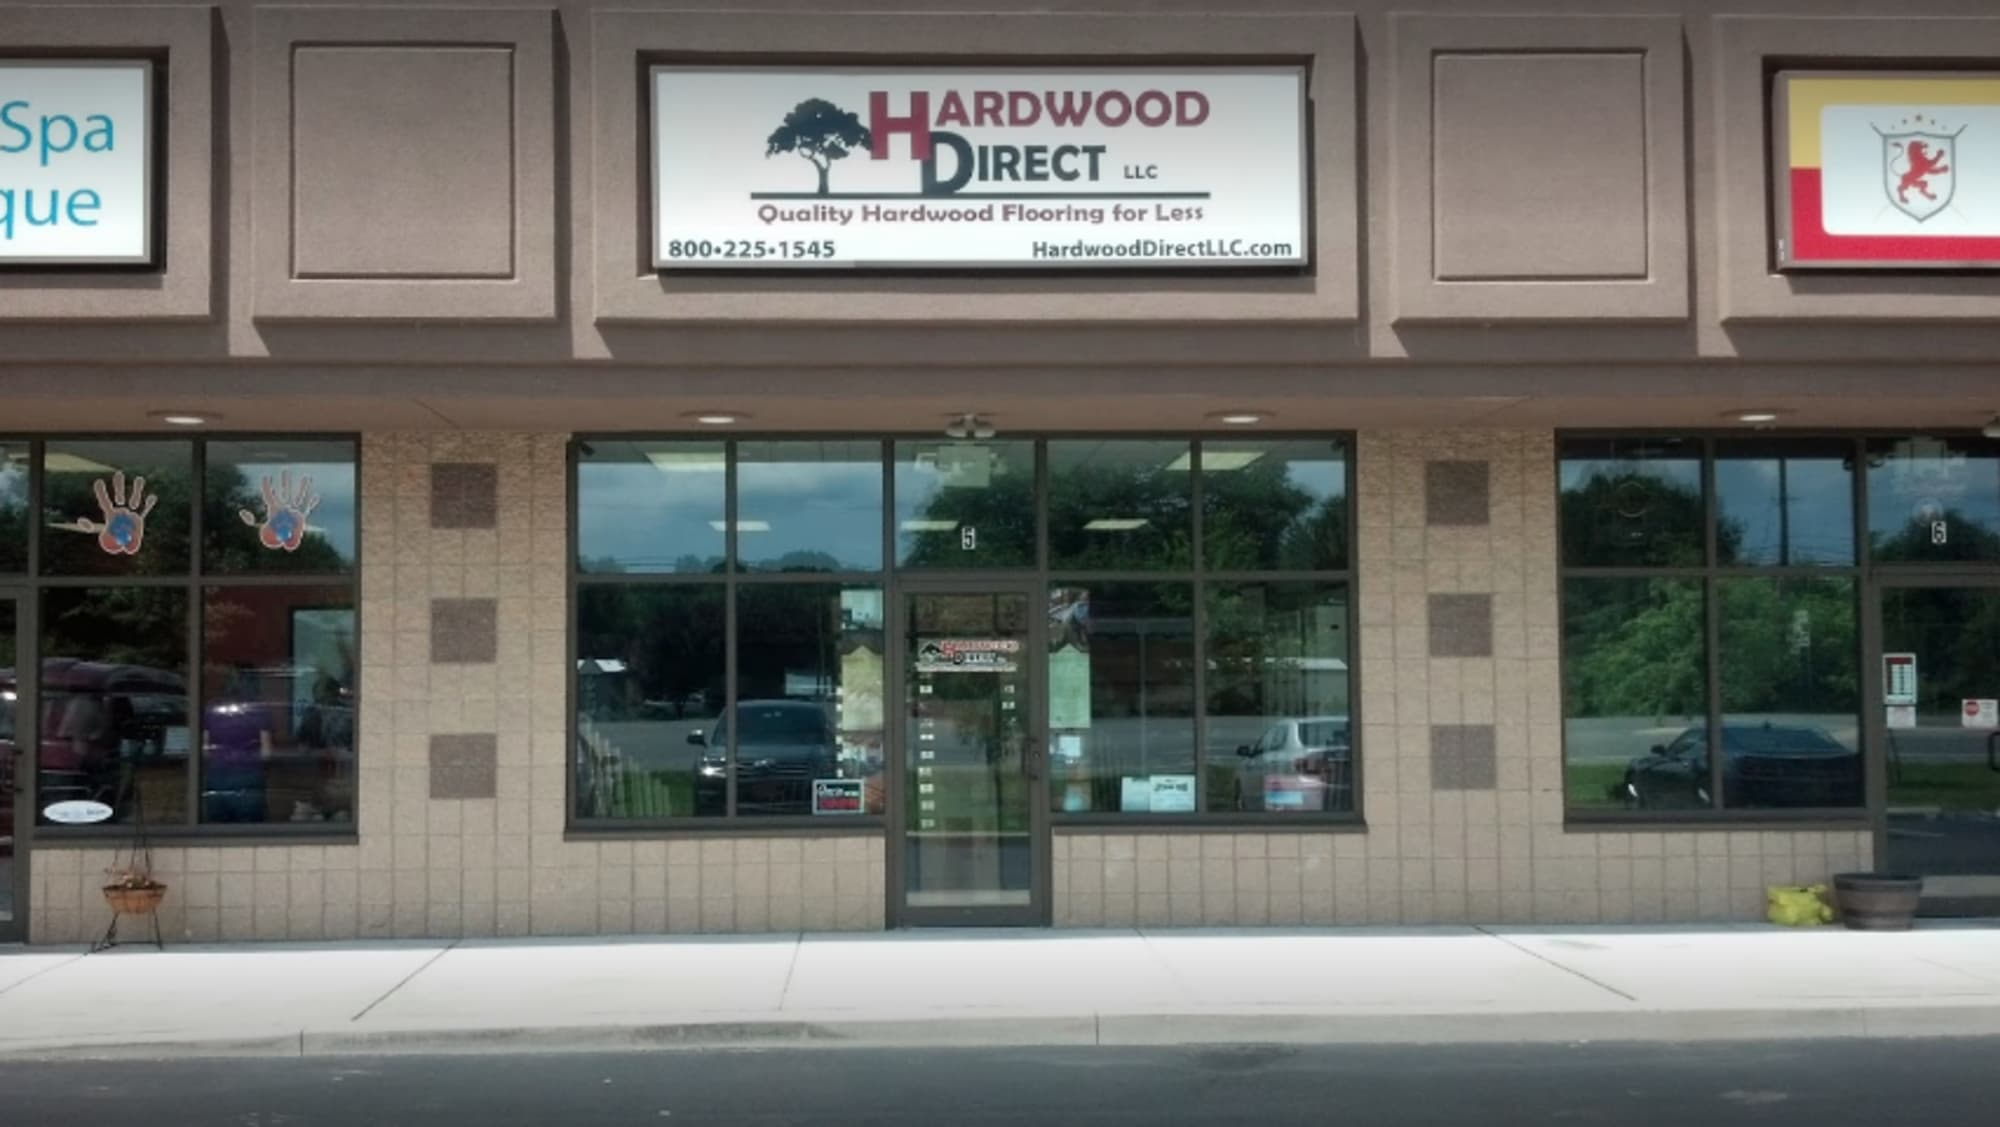 Hardwood Direct - 4390 Summit Bridge Rd Middletown, DE 19709